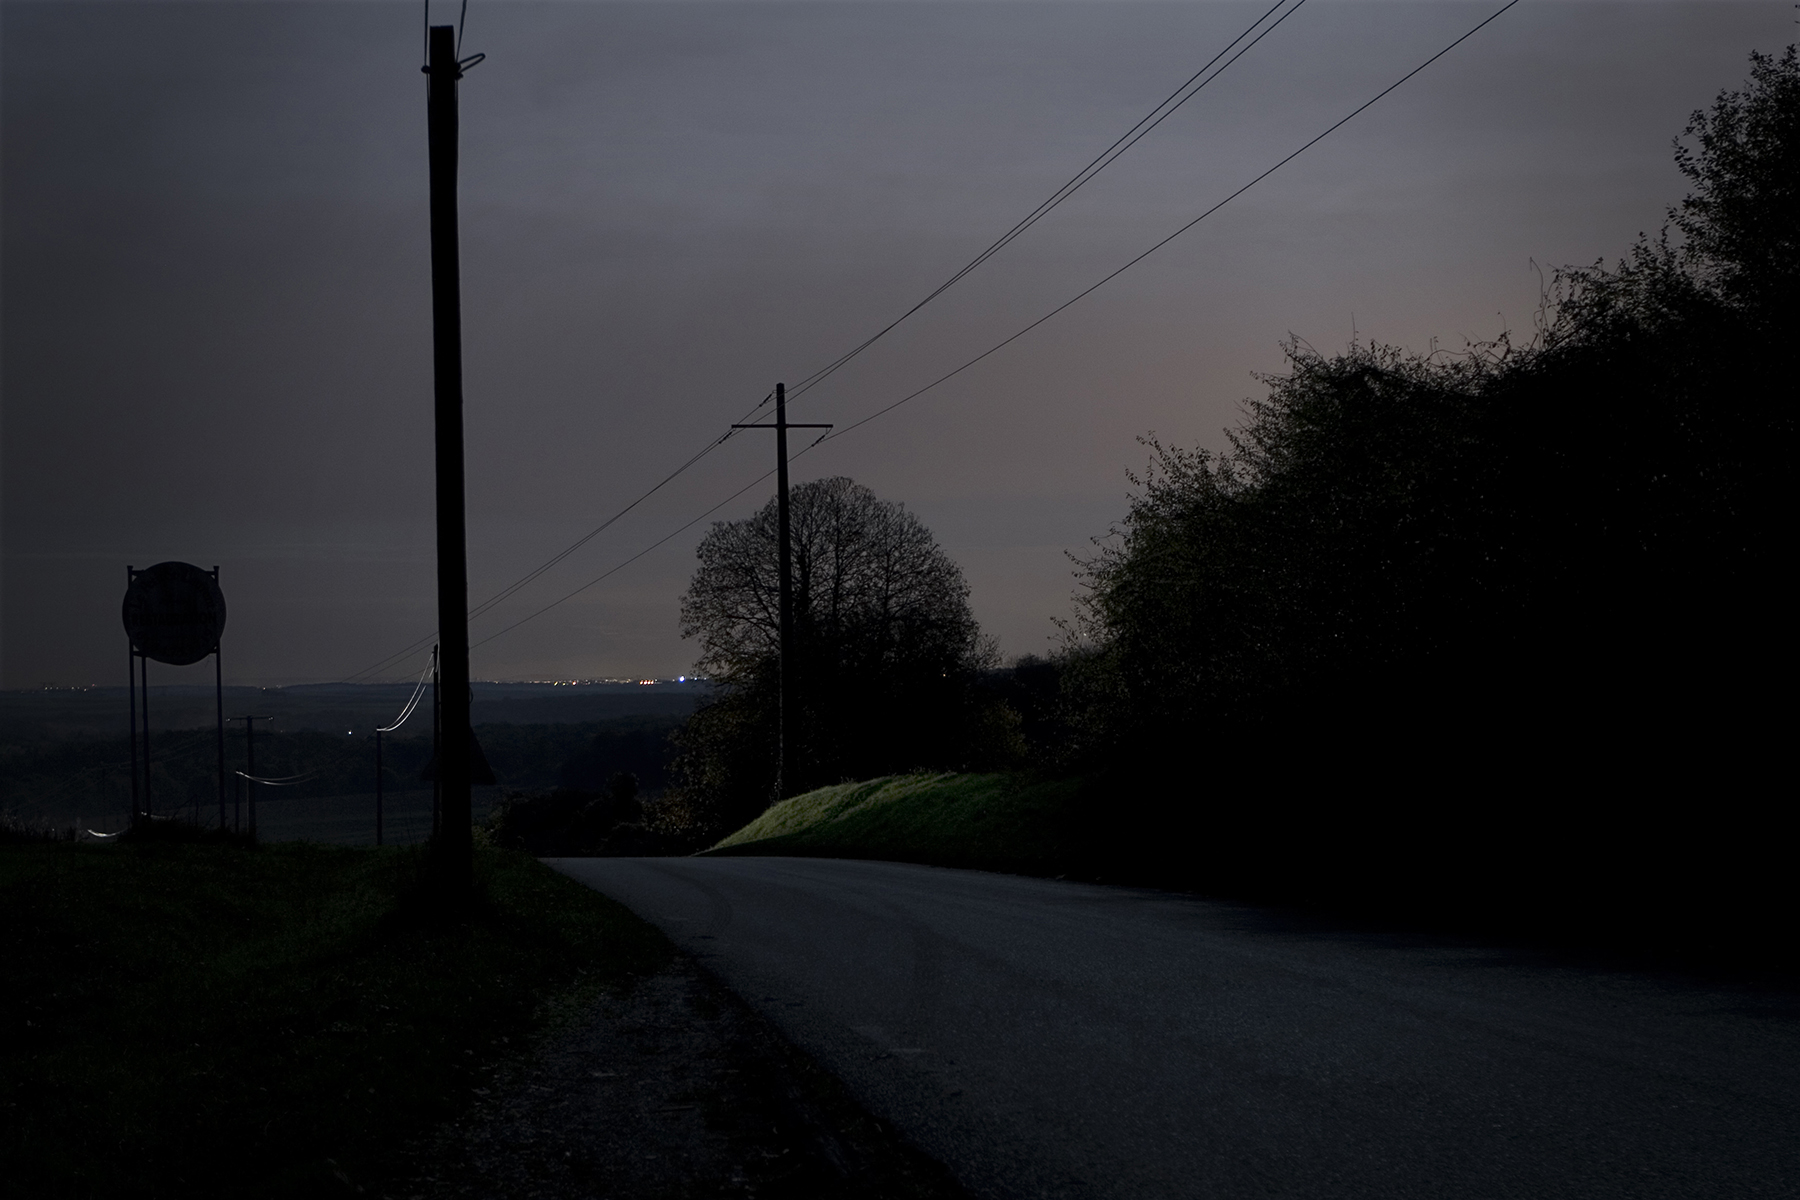 paysage_nuit01 copy.jpg